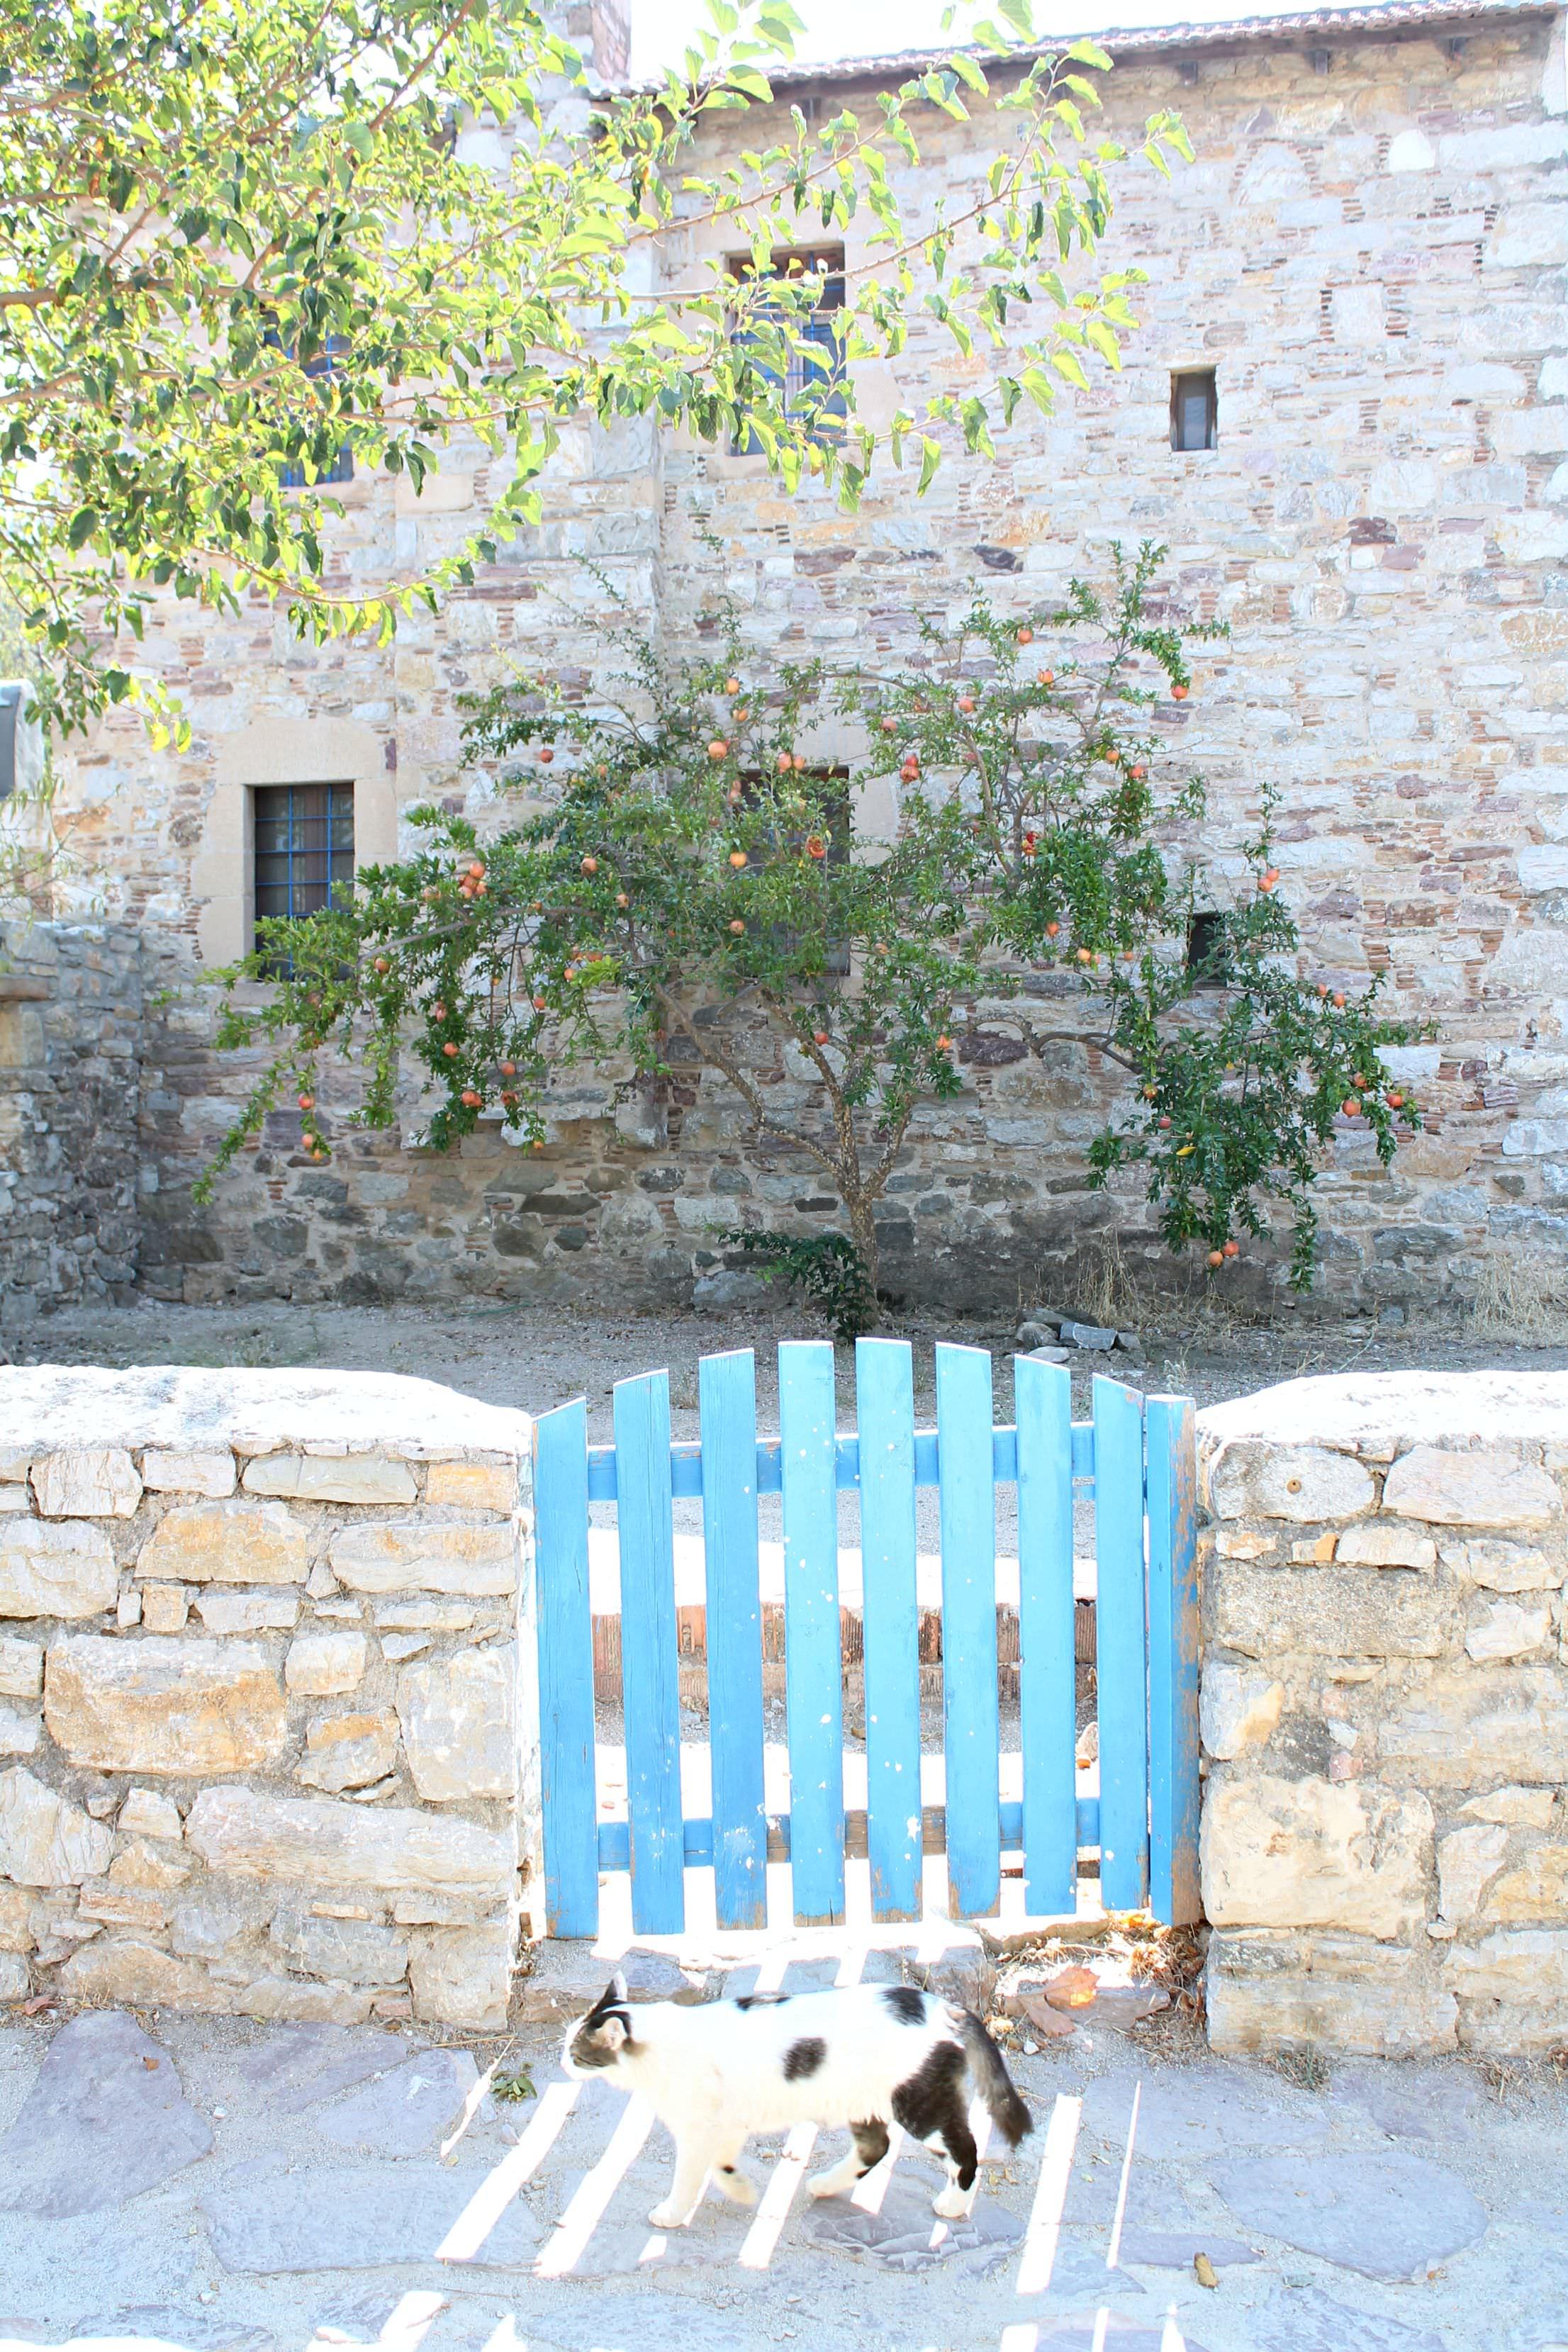 Eski-Datca-village-charm-photo-by-Little-Big-Bell